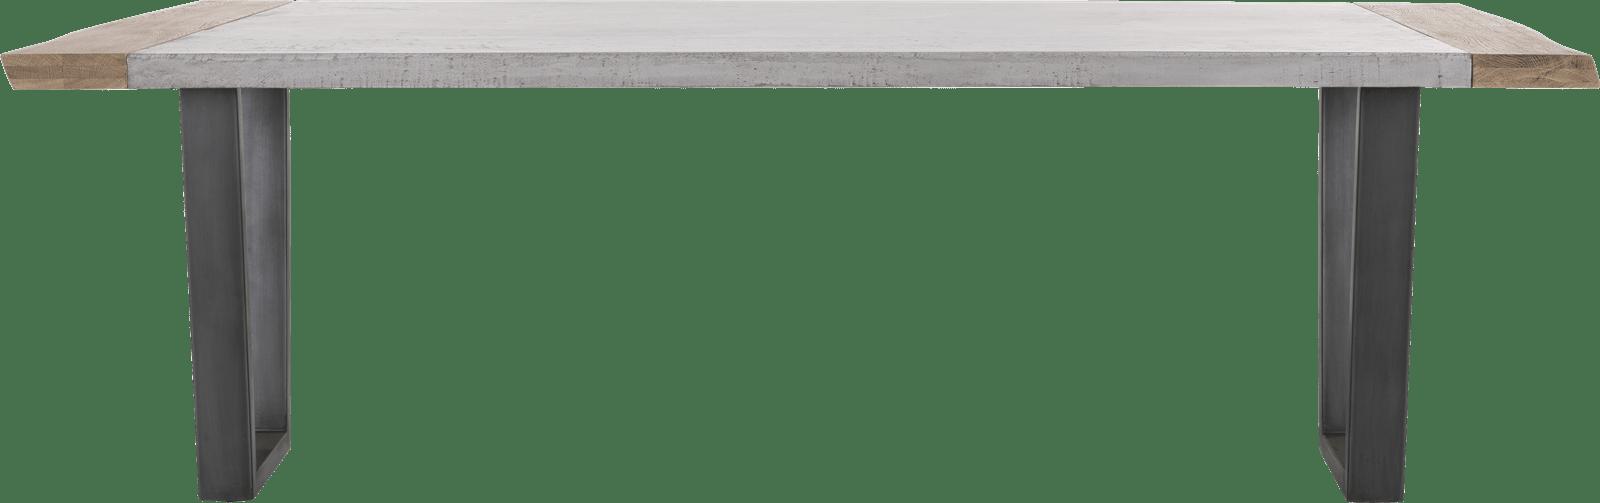 Farmer - eetkamertafel 210 x 100 cm